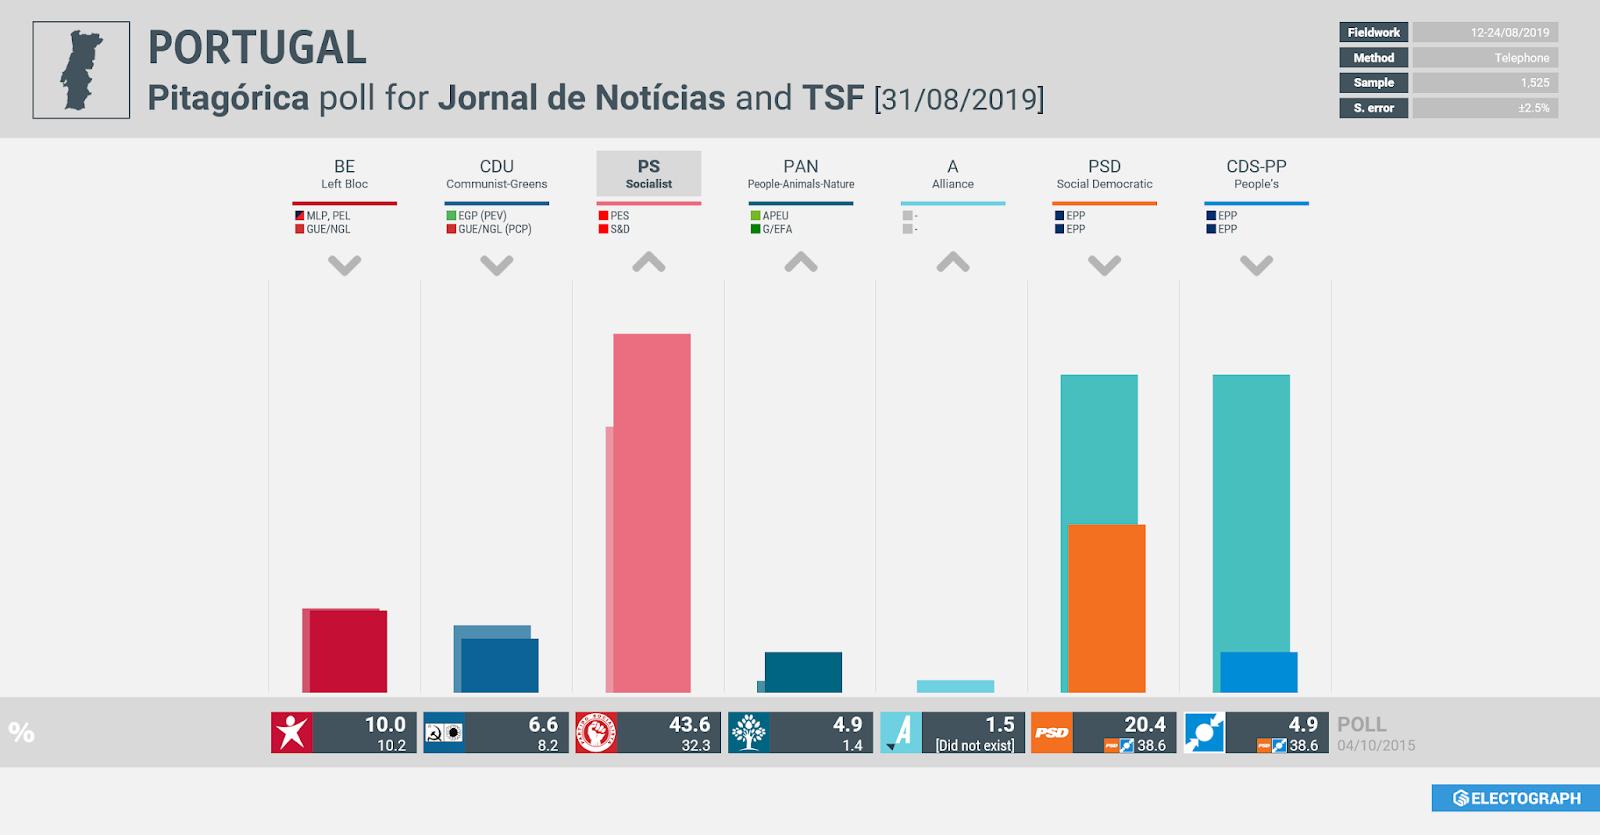 PORTUGAL: Pitagórica poll for Jornal de Notícias and TSF, 31 August 2019